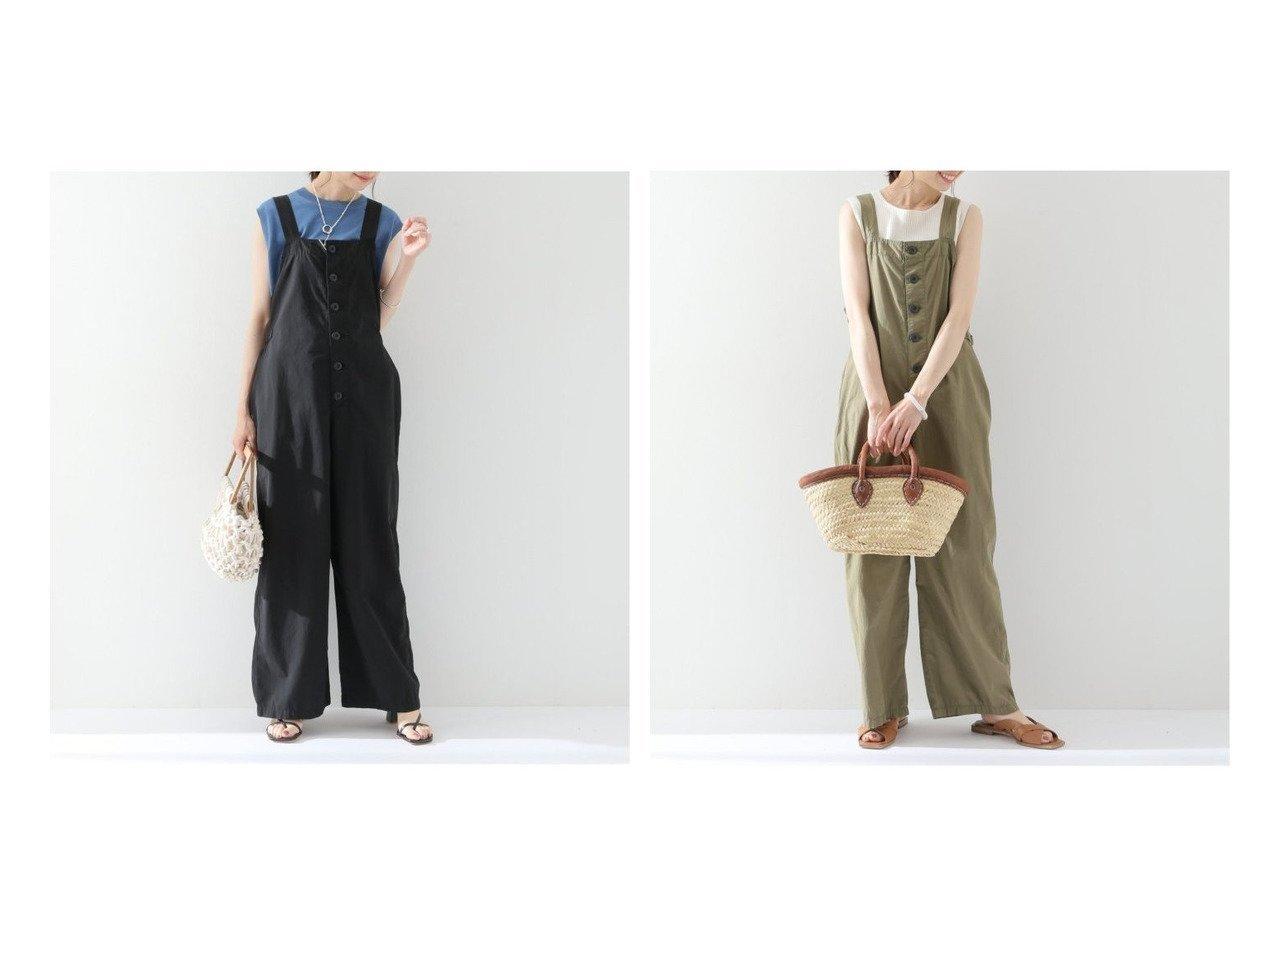 【IENA/イエナ】のリップストップオーバーオール 【パンツ】おすすめ!人気、トレンド・レディースファッションの通販 おすすめで人気の流行・トレンド、ファッションの通販商品 インテリア・家具・メンズファッション・キッズファッション・レディースファッション・服の通販 founy(ファニー) https://founy.com/ ファッション Fashion レディースファッション WOMEN ワンピース Dress サロペット Salopette 2021年 2021 2021春夏・S/S SS/Spring/Summer/2021 S/S・春夏 SS・Spring/Summer おすすめ Recommend カーゴパンツ タンク リップ  ID:crp329100000051201